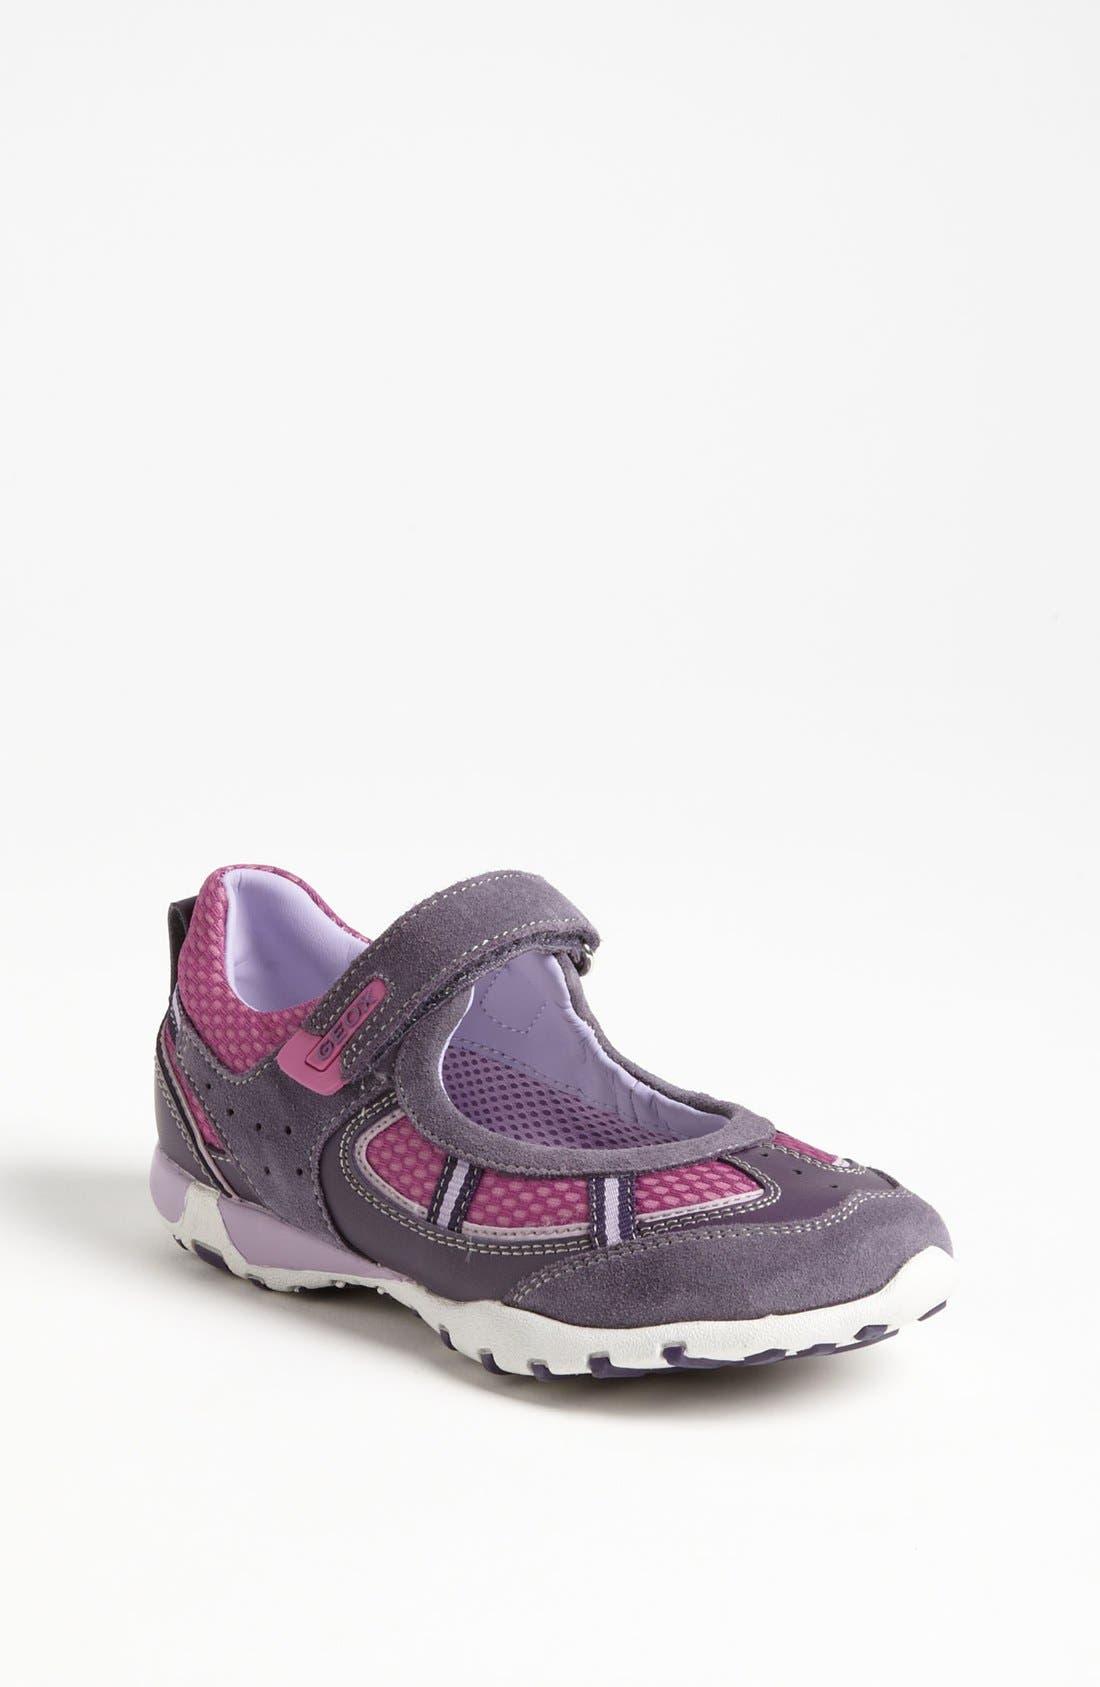 Main Image - Geox 'Freccia G' Sneaker (Toddler, Little Kid & Big Kid)